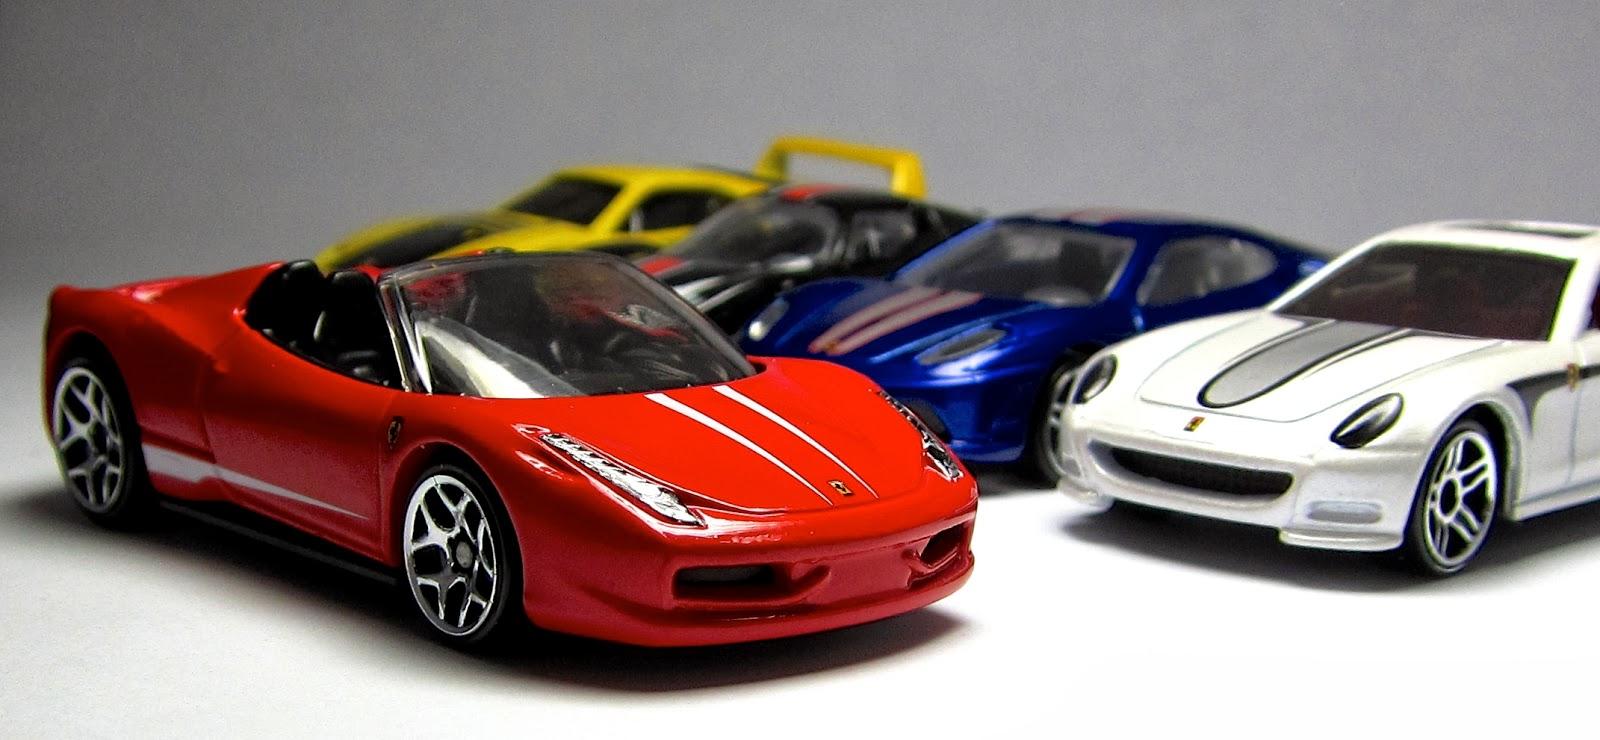 Hot Wheels 5 Pack Cars Pakistan S Best Online Mart